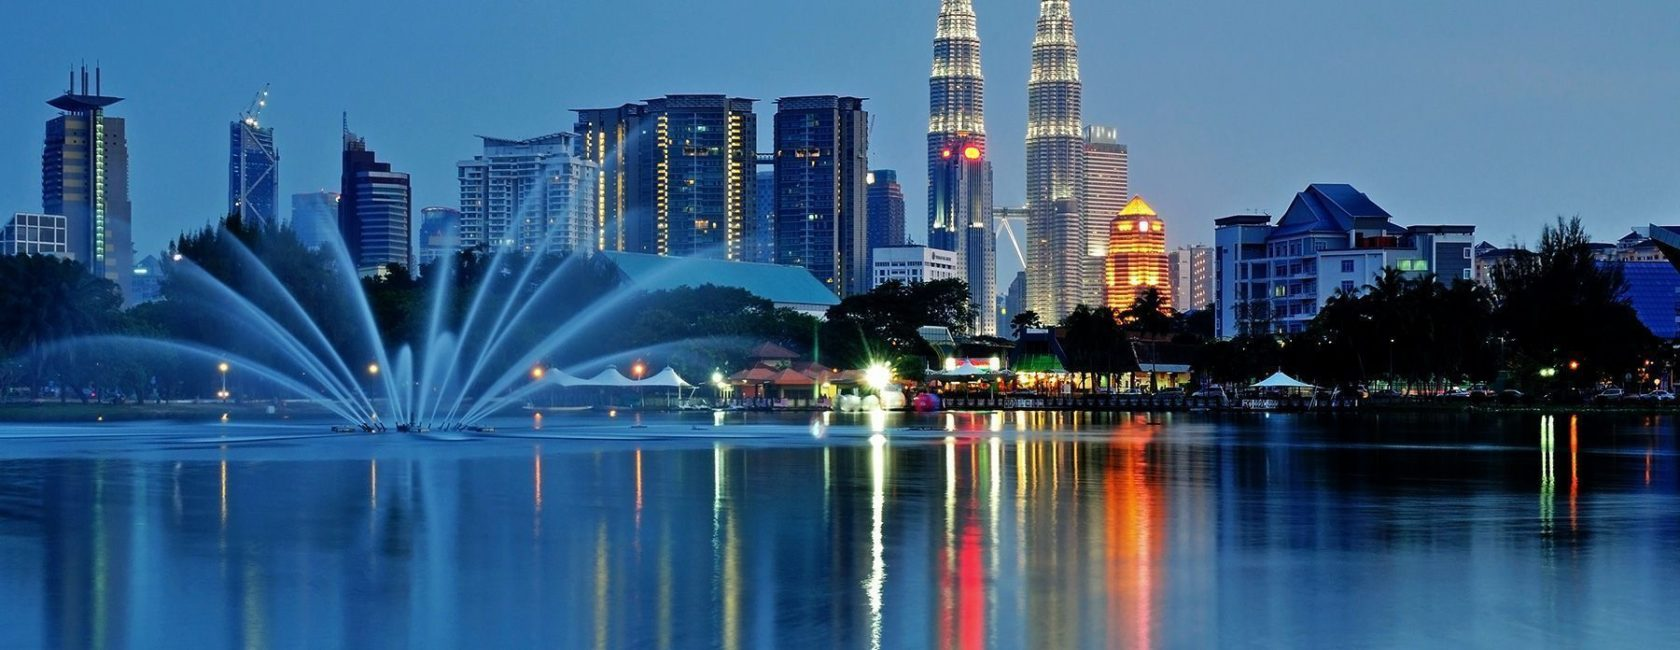 11 skjulte skatter i Kuala Lumpur